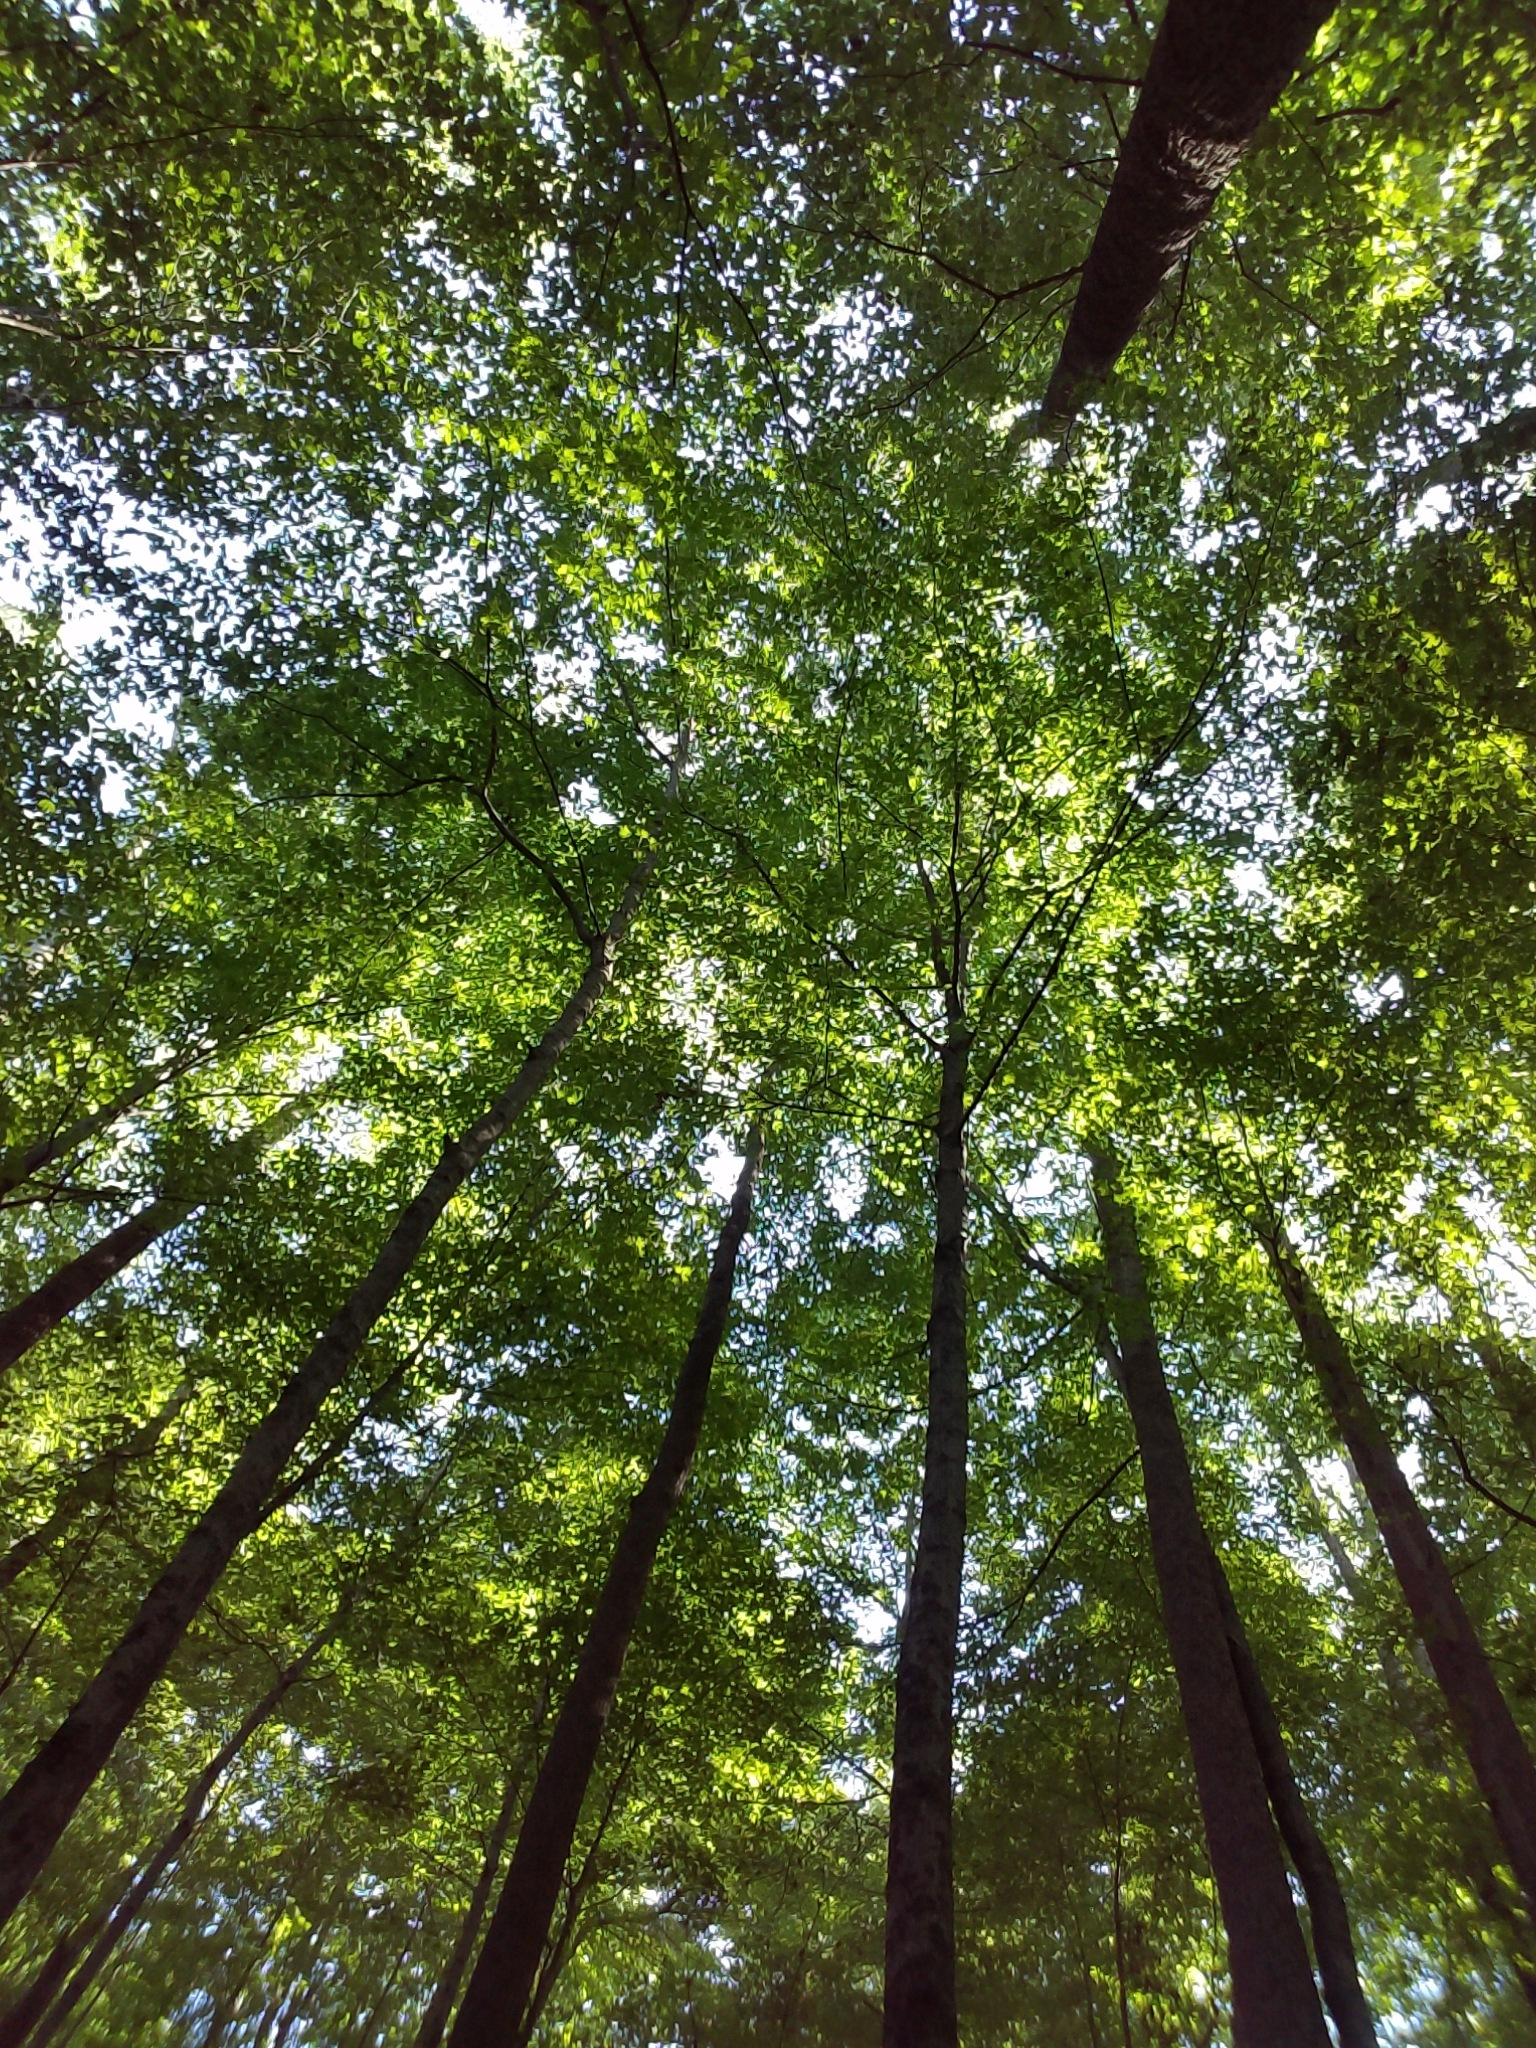 Trees Selfie by deanna.j.gallion